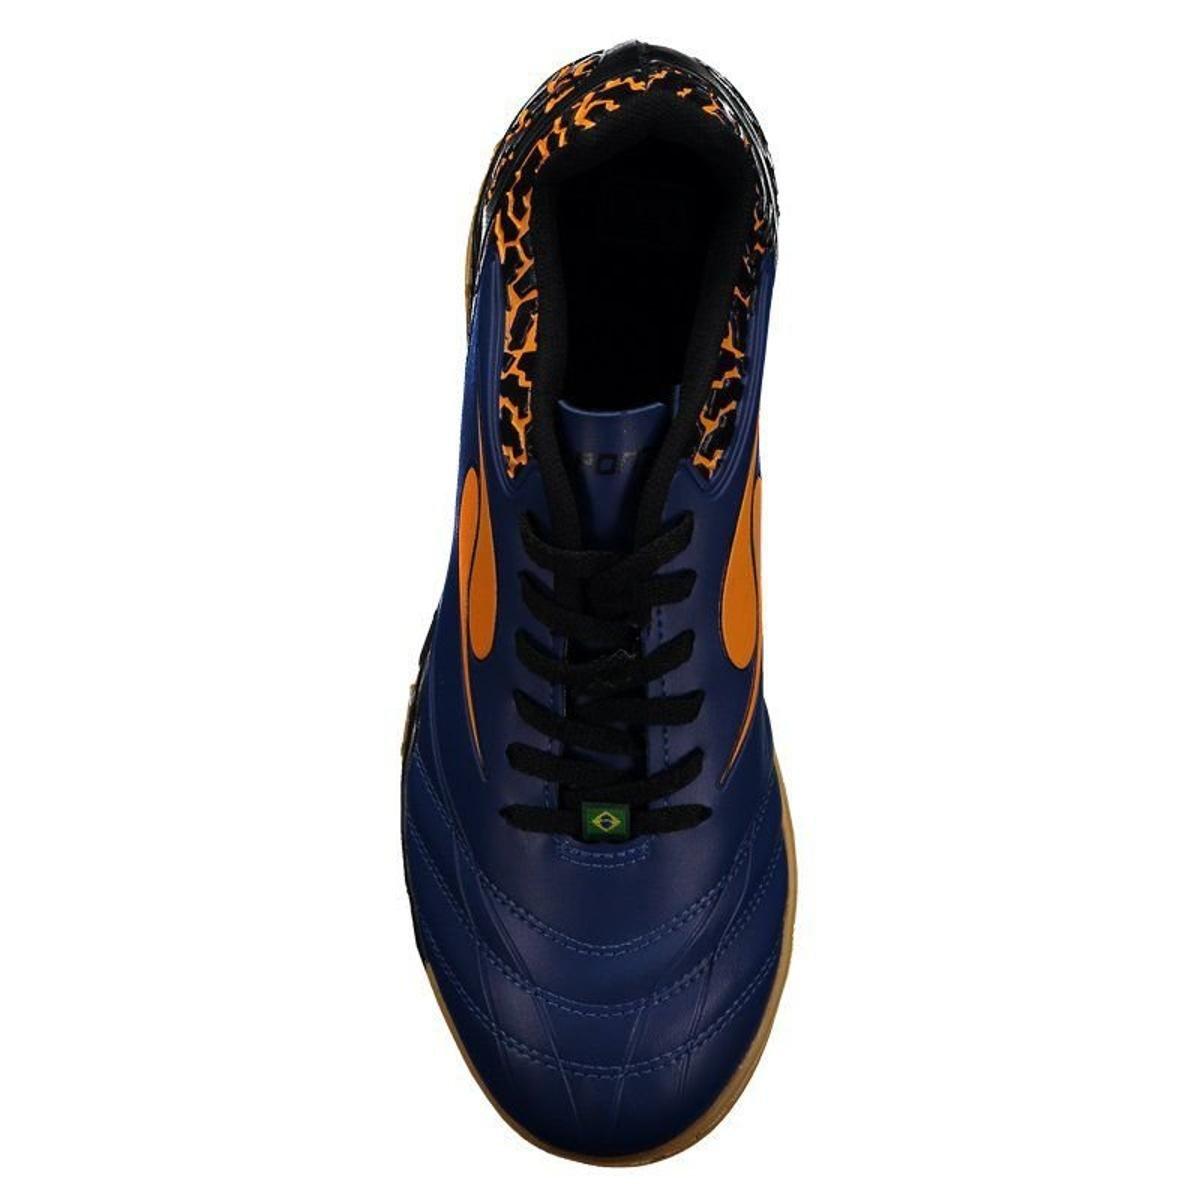 Chuteira Futsal Dalponte Eletric Masculina - Azul - Compre Agora ... 728665e10a325